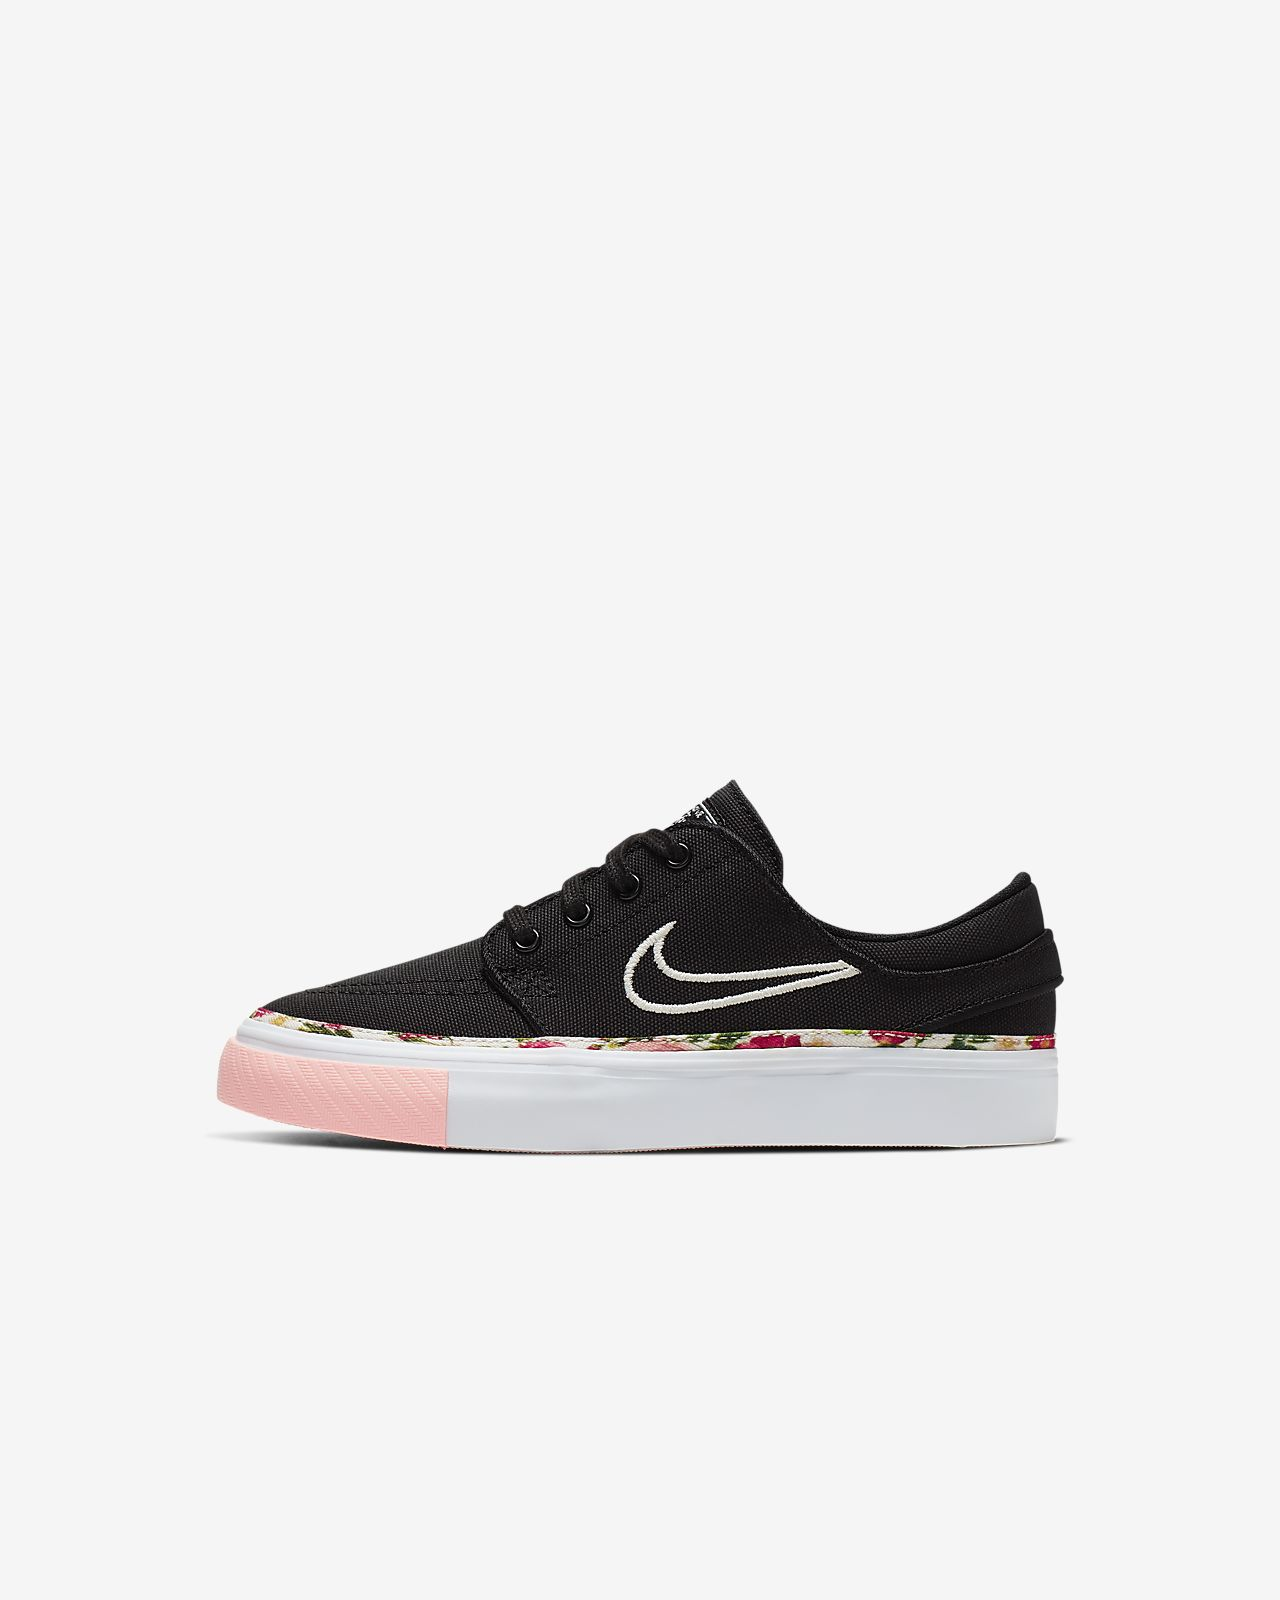 Nike SB Stefan Janoski VF Skateboardschuh für jüngere Kinder